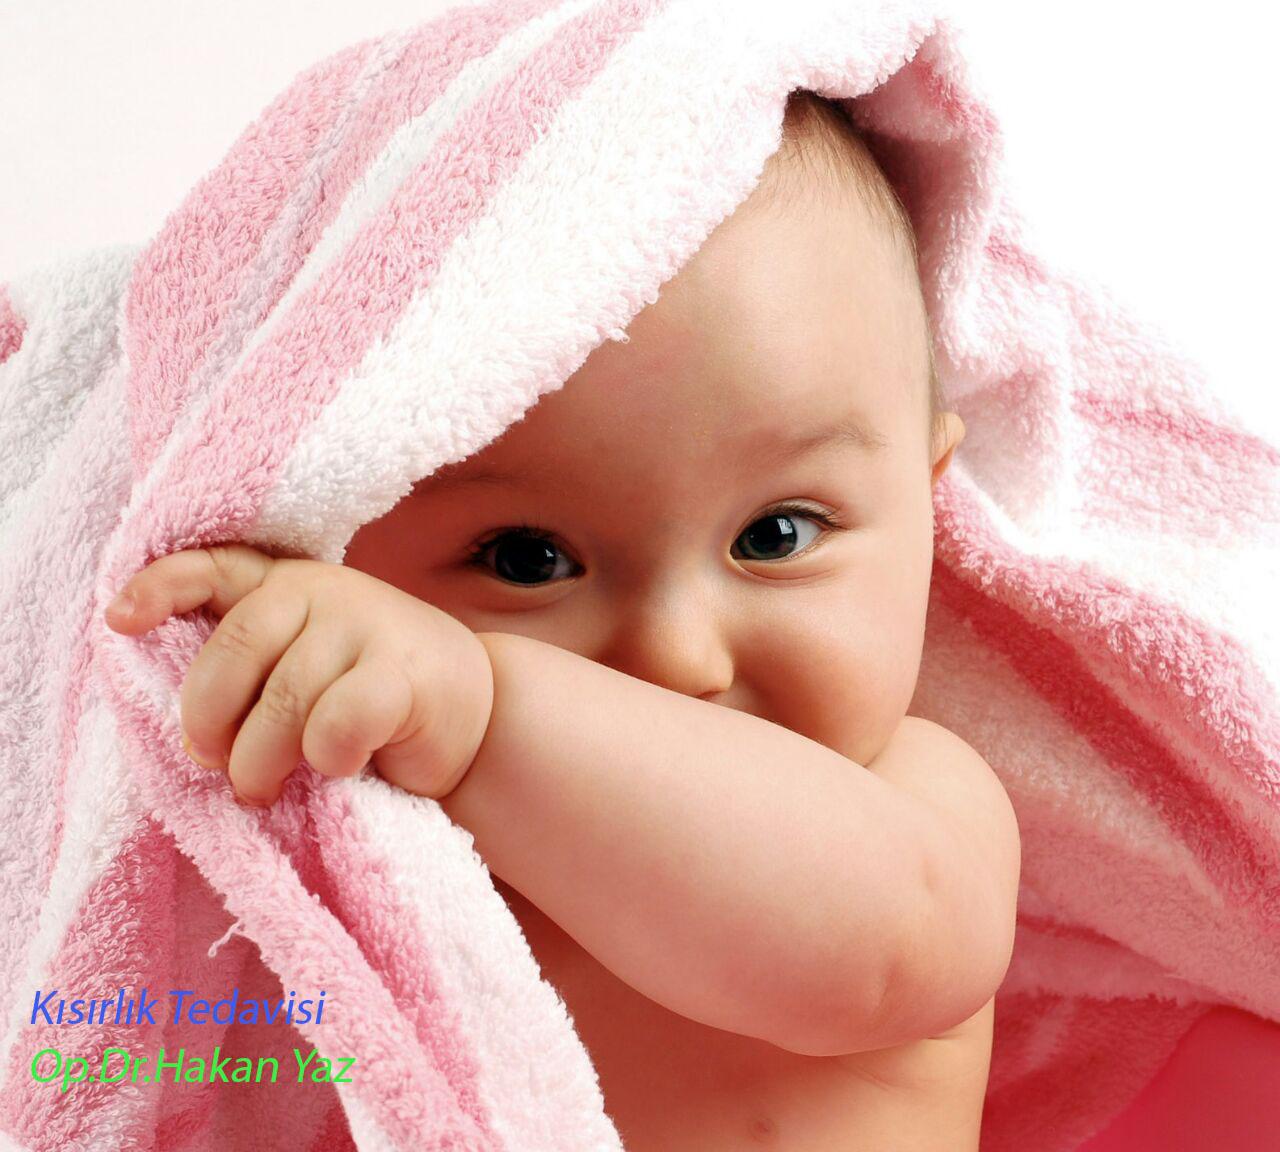 İnfertilite (kısırlık) nedir? İnfertilite (Kısırlık) Nedir? sanjeevni infertility and test tube baby centre kanpur 1467359065 57761f59927c4vvvvv